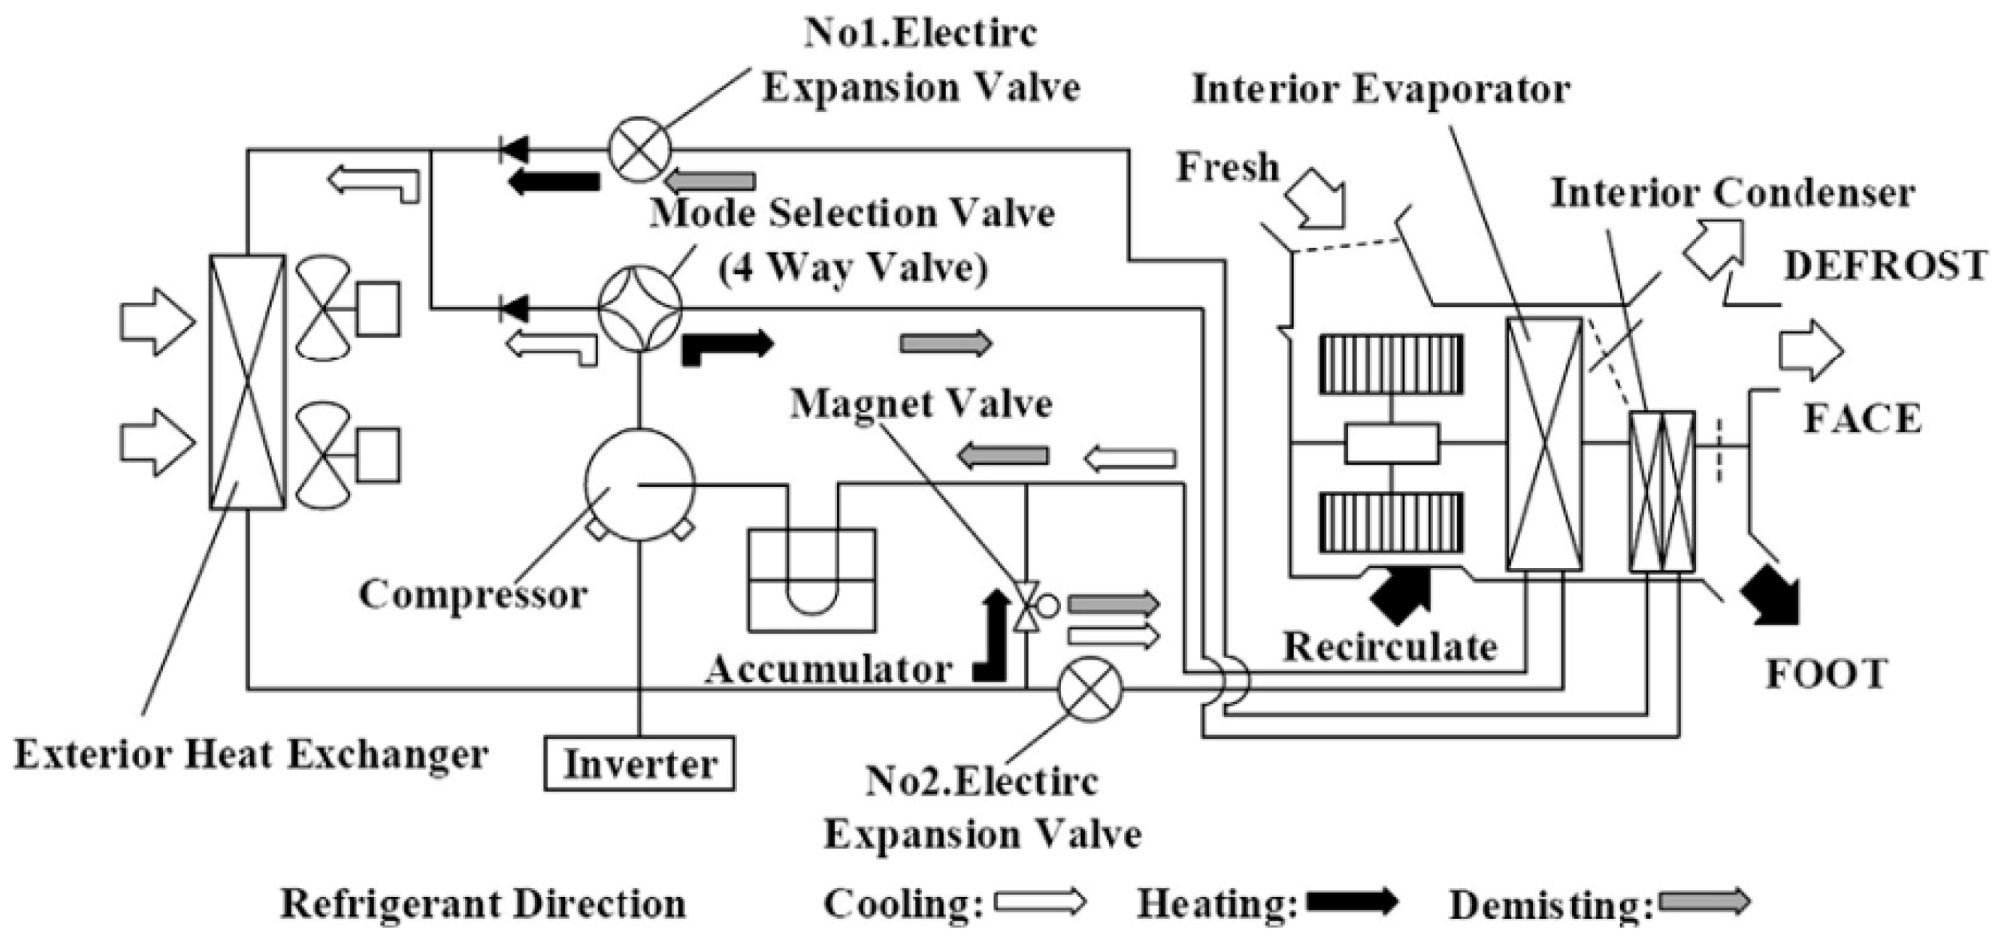 hight resolution of automobile ac system diagram energies free full text of automobile ac system diagram car car a c